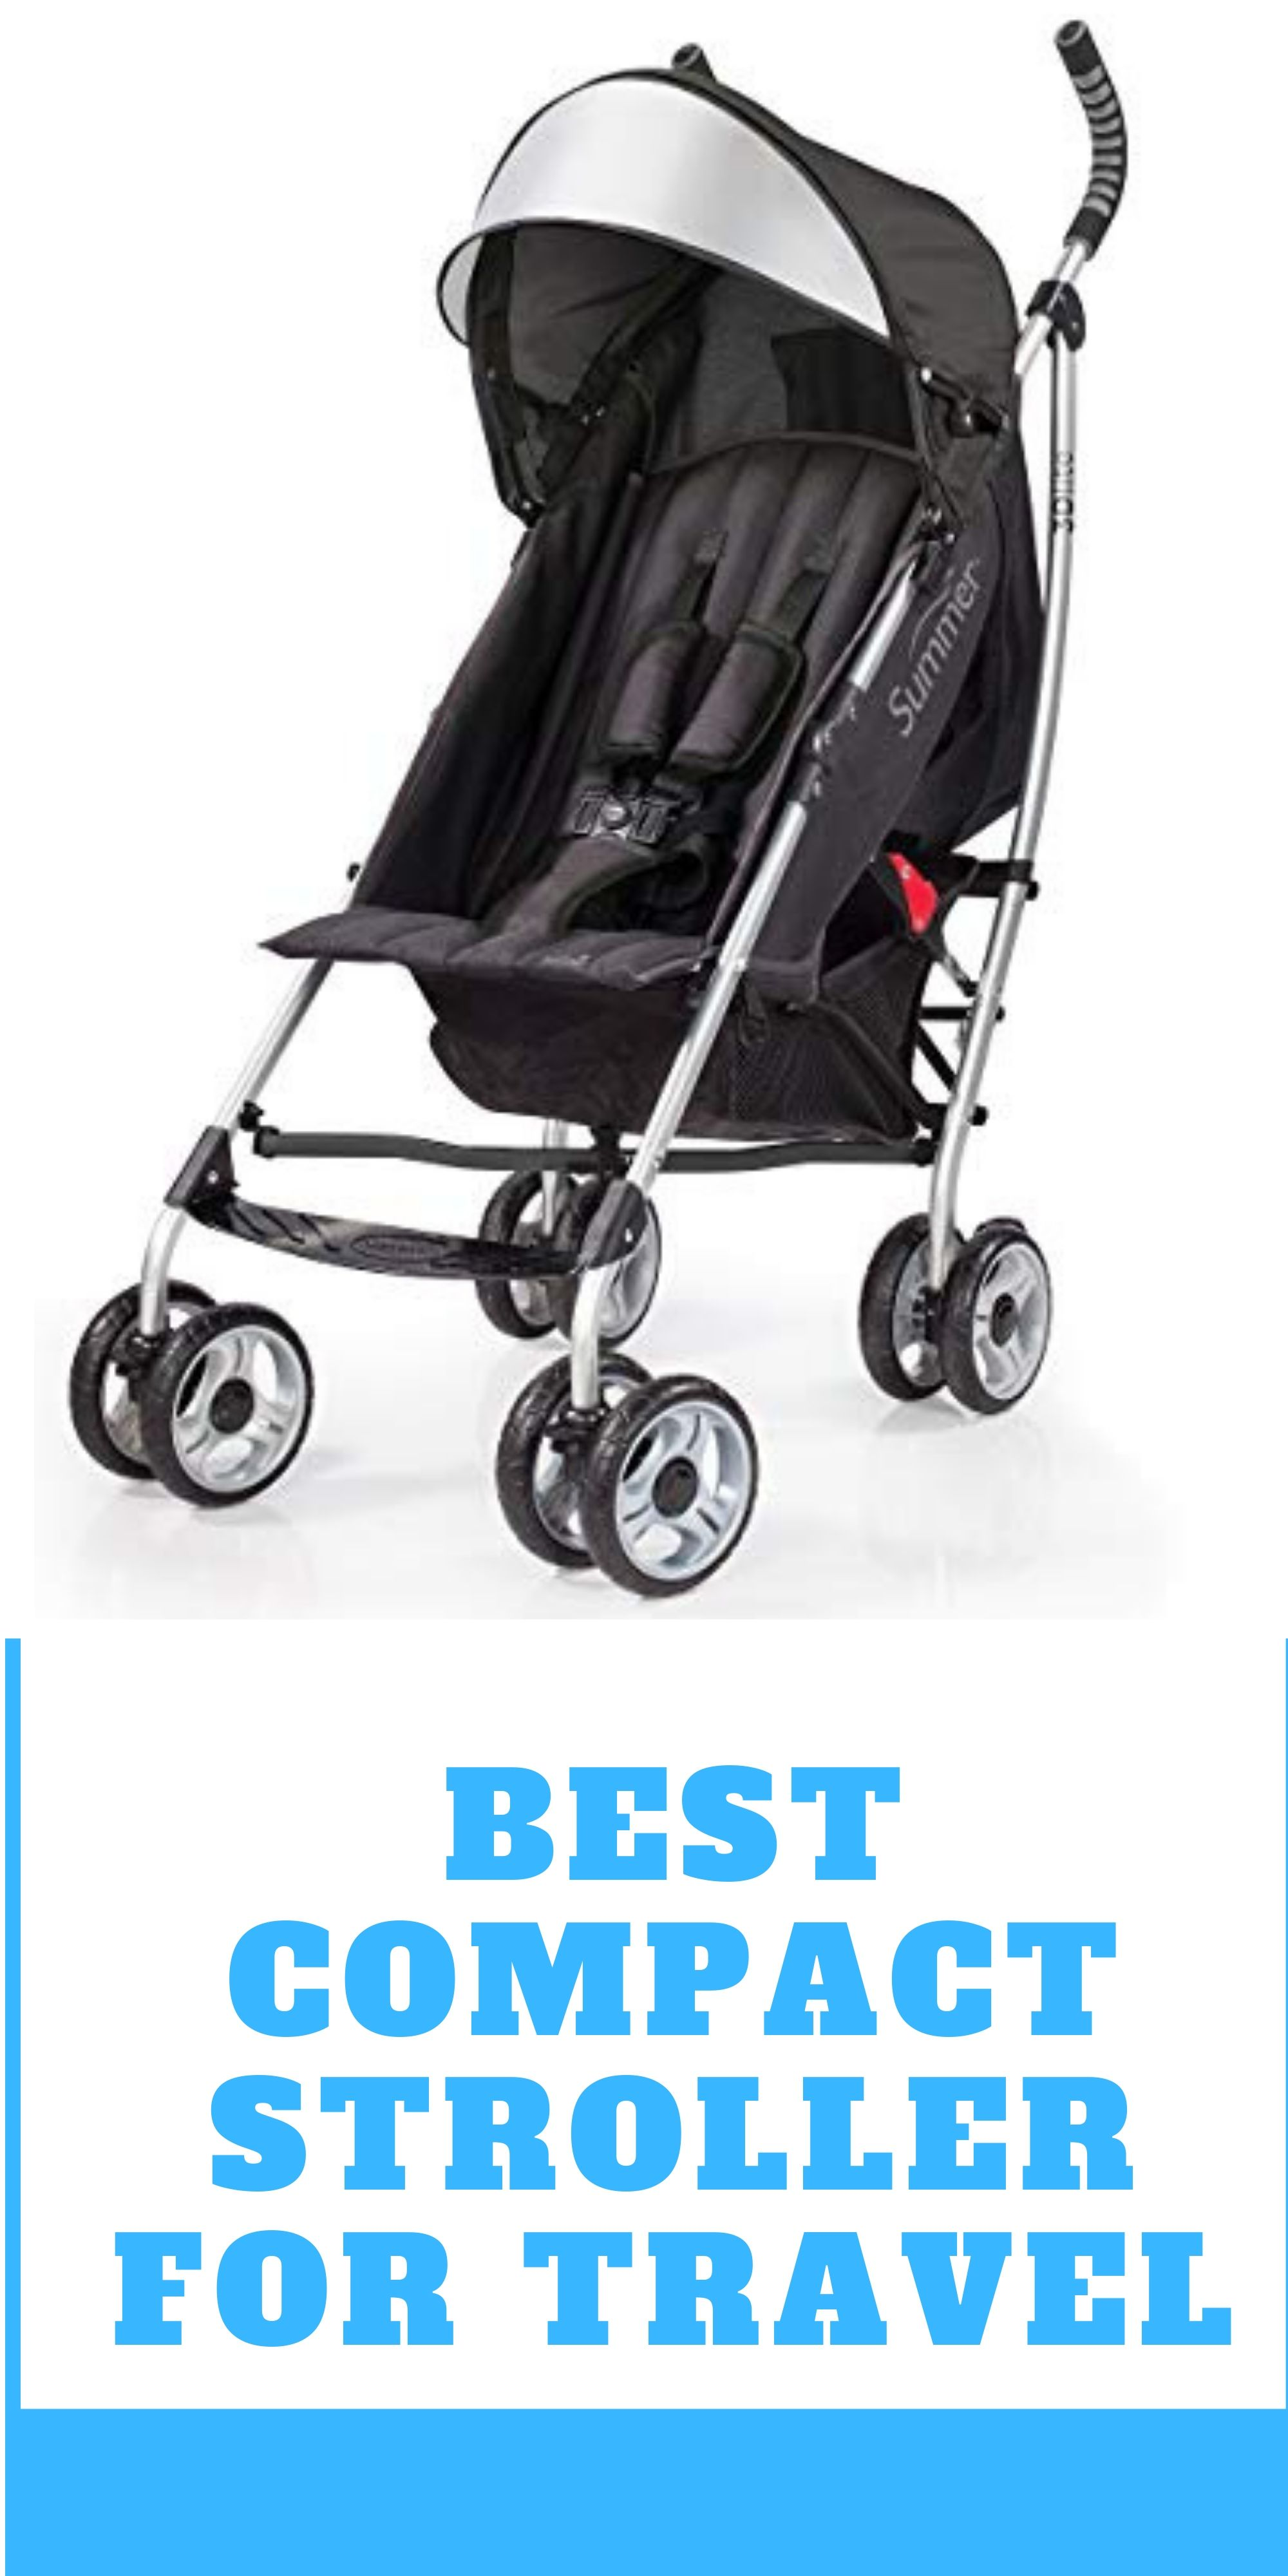 10 Best Compact Stroller For Travel Best travel stroller